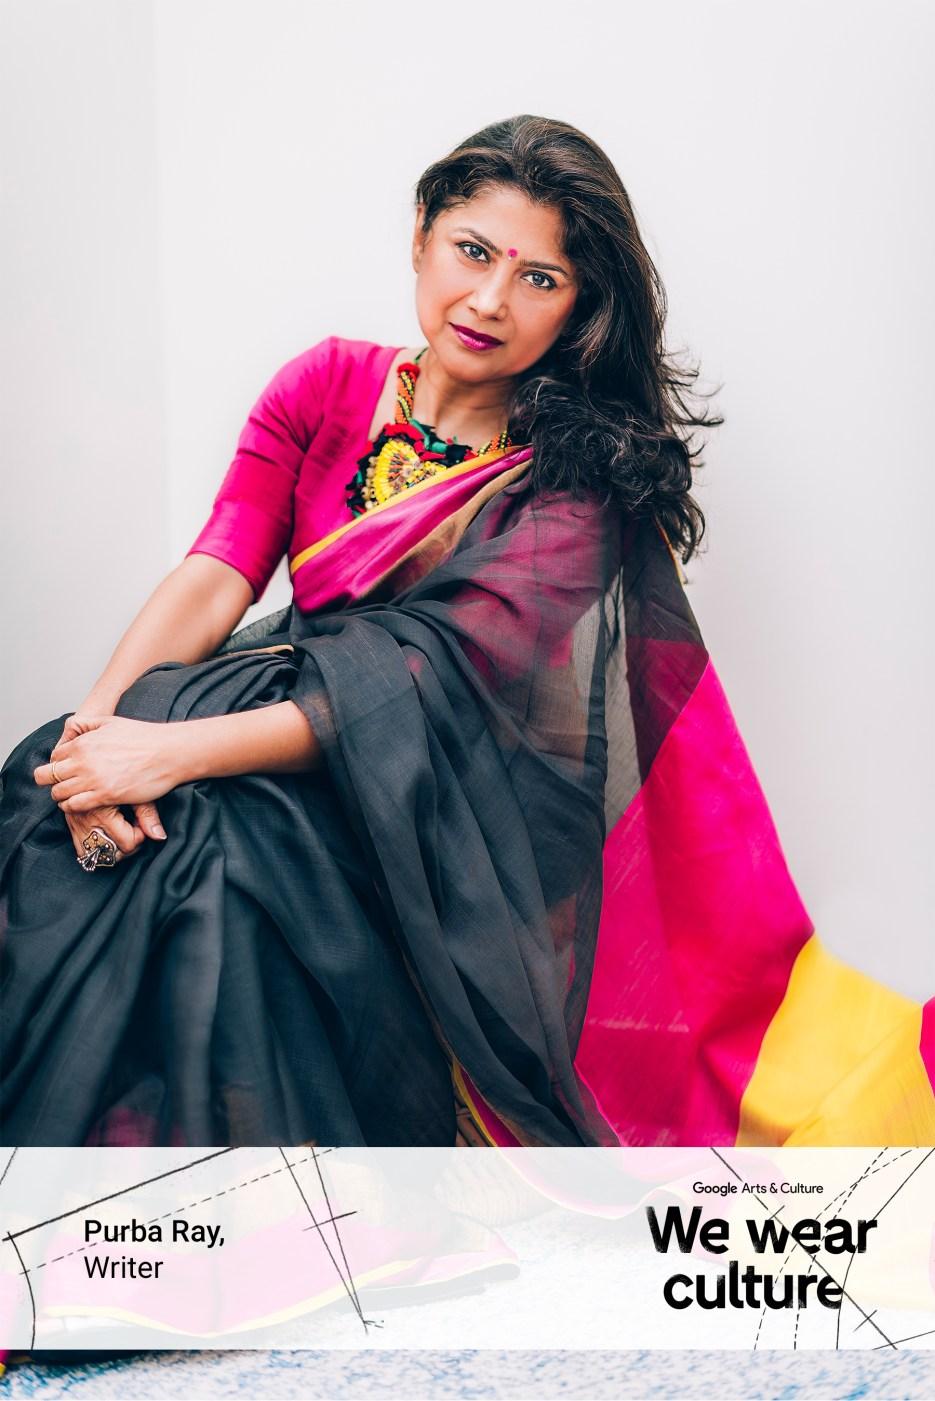 Naina.co, Naina Redhu, Google India, Google, Google Arts & Culture, #SareeOnMe, #WeWearCulture, #NAINAxGoogle, Professional Photographer, Blogger, Lifestyle Photographer, Lifestyle Blogger, Travel, Saree, Drape, Drapes, Draping, Textiles, India, Style, Ajmira Shaikh, Karishma Yadav, Sahiba Gursahaney, Ashu Mittal, Sejal Kumar, Anupriya Kapur, Bhumika Bhatia, Nicole Juneja, Purba Ray, Anjali Batra, Surabhi Chauhan, Nayantara Parikh, #EyesForPeople, #EyesForInfluencers, Influencers, Influencer Marketing, Portraiture, Portrait Photographer, Google Feature, Twelve Women, Arts, Culture